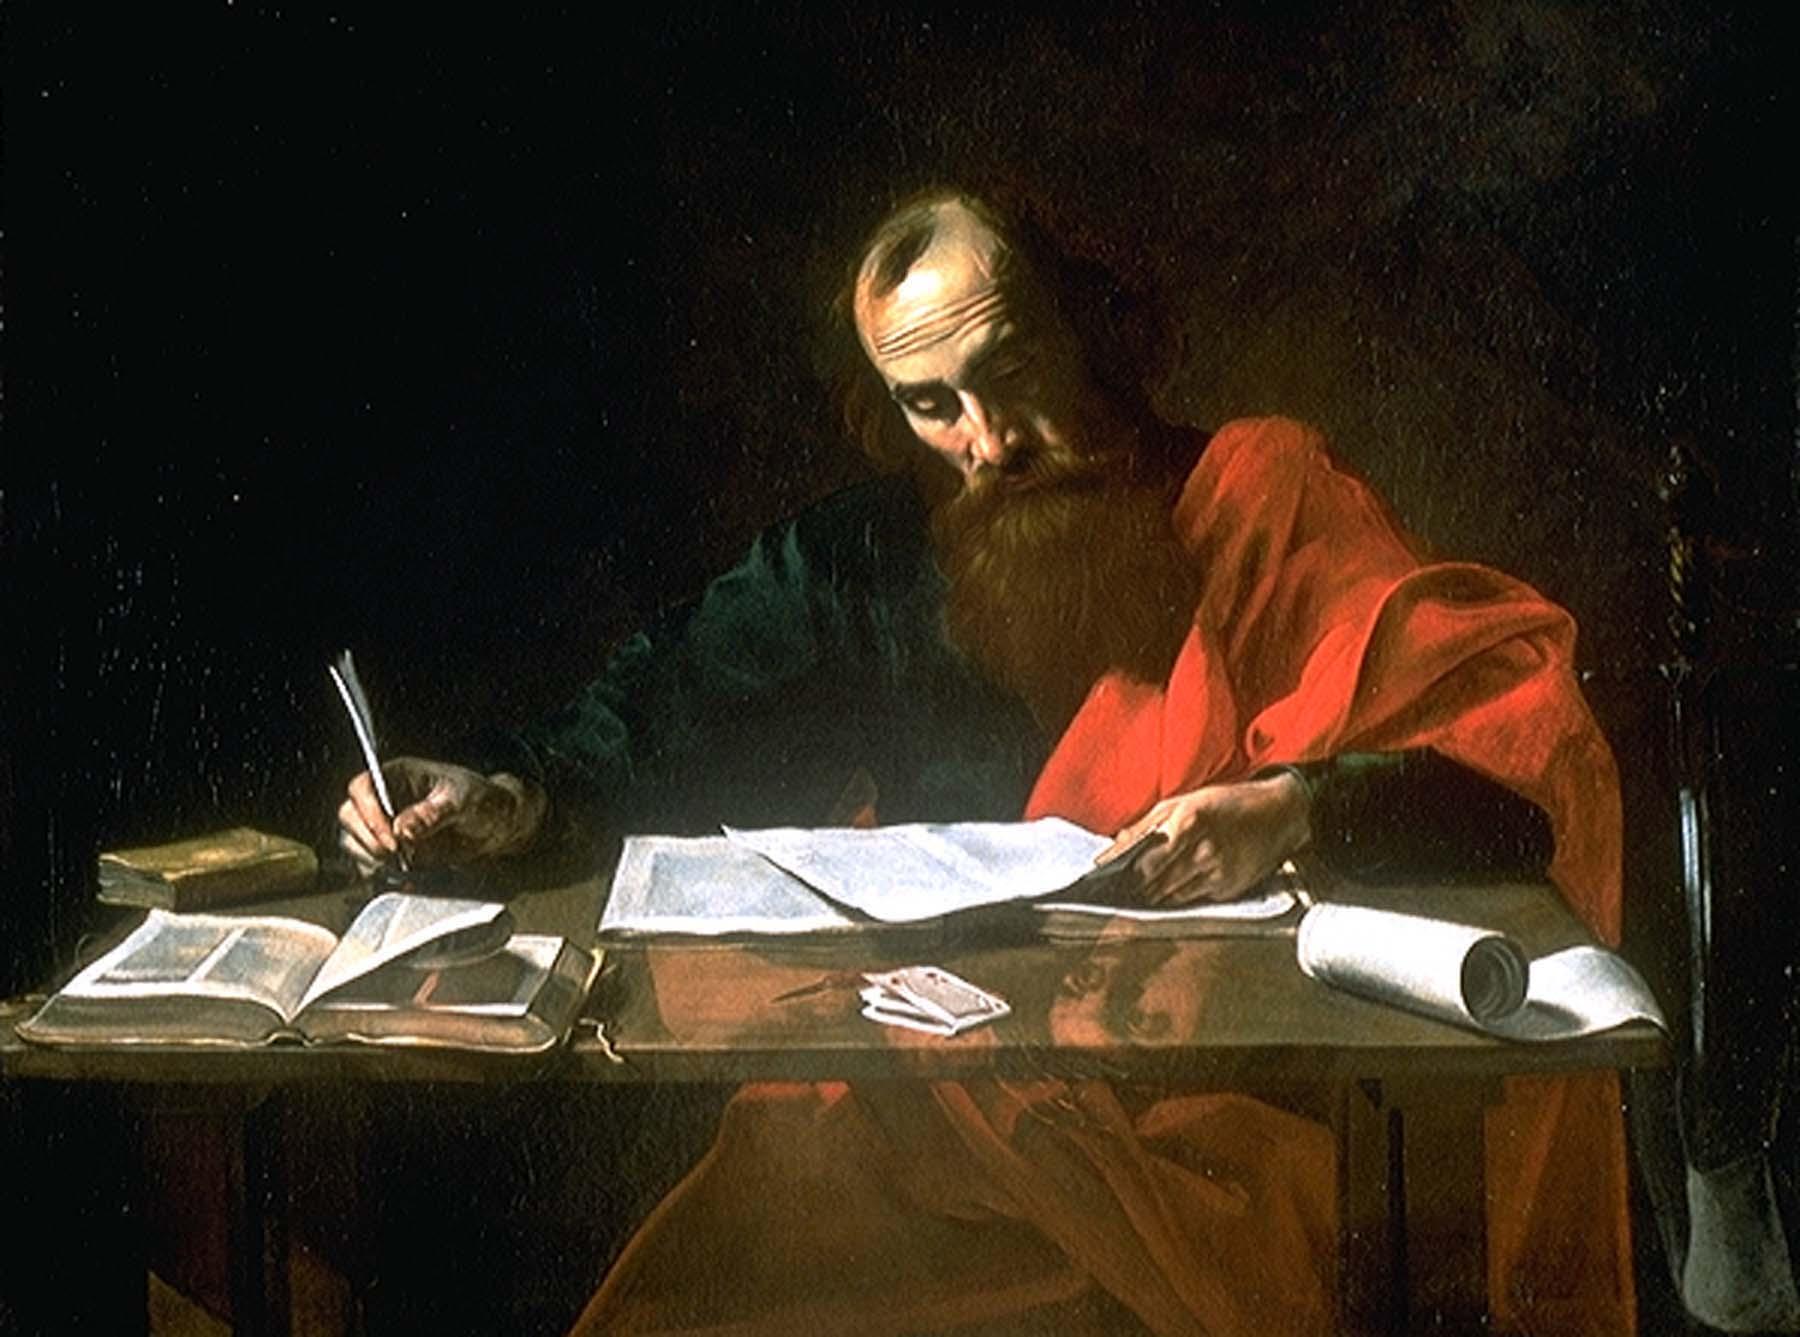 Artwork Depicting St Paul The Apostle